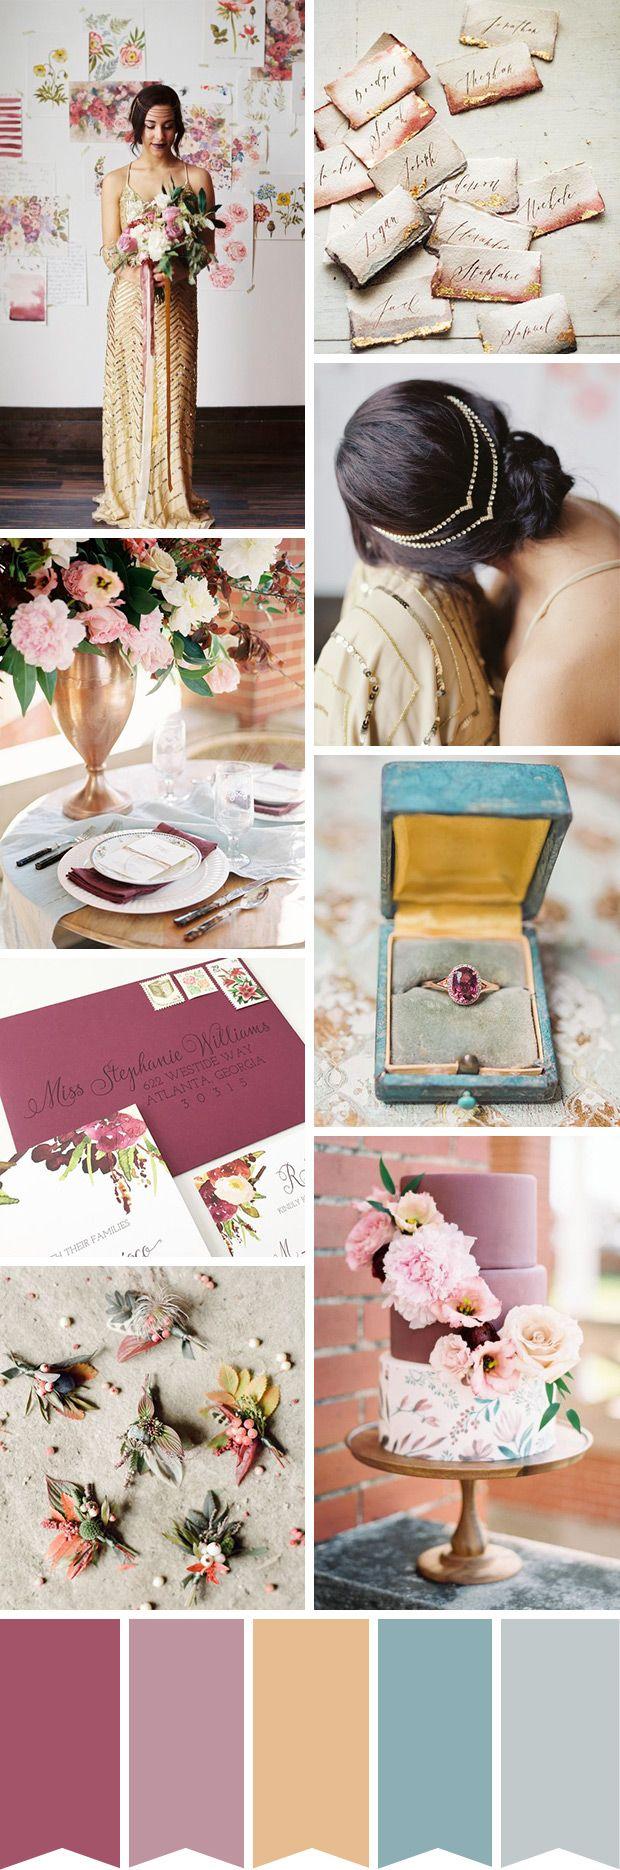 A Glistening Floral Inspired Wedding // www.onefabday.com